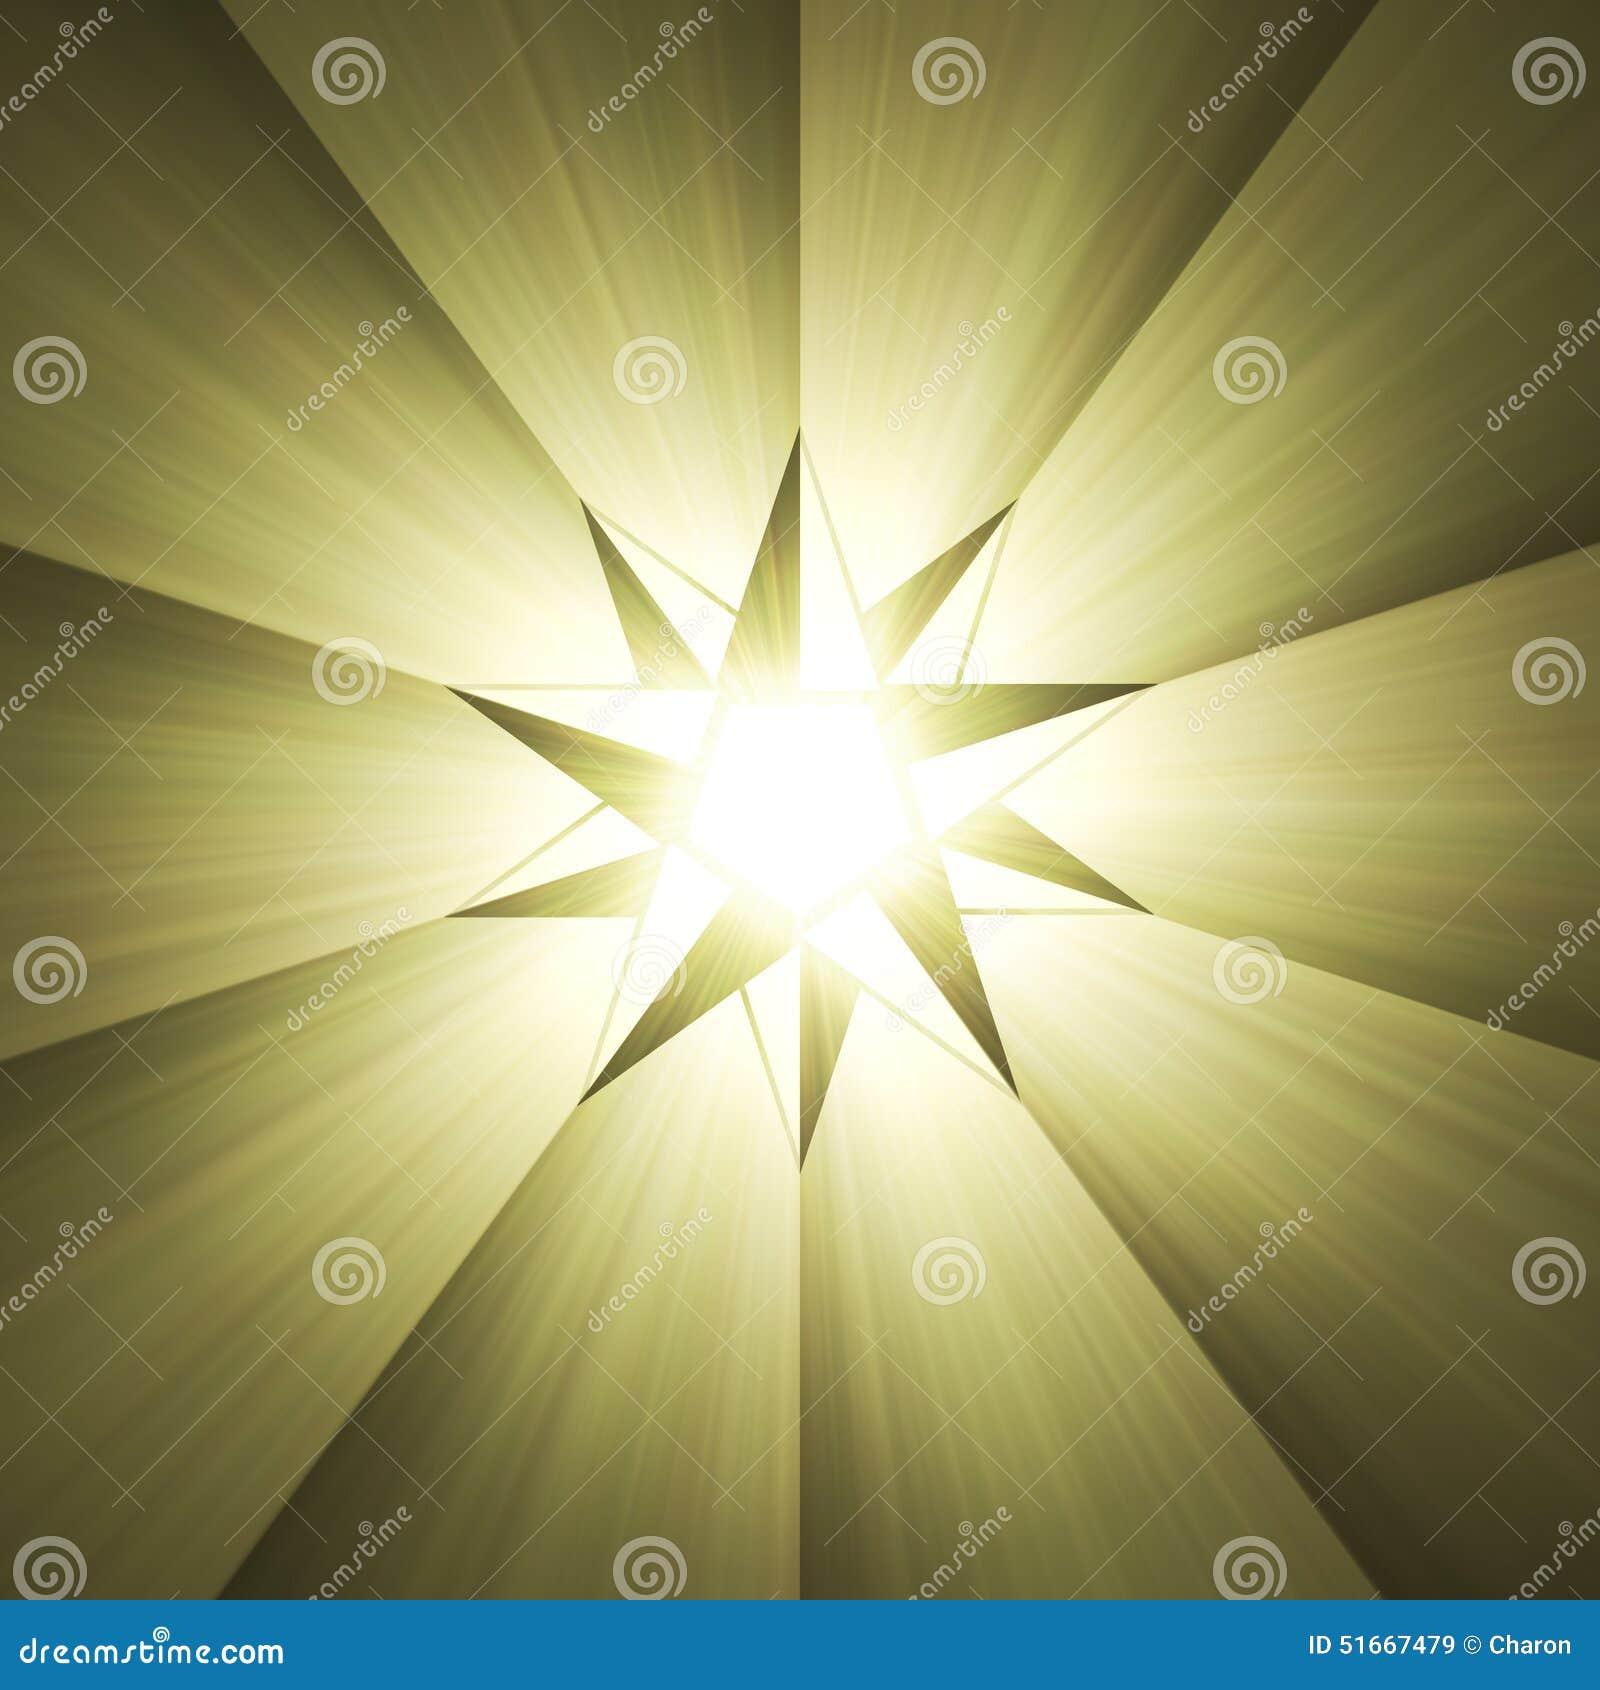 Compass eight point star light flare